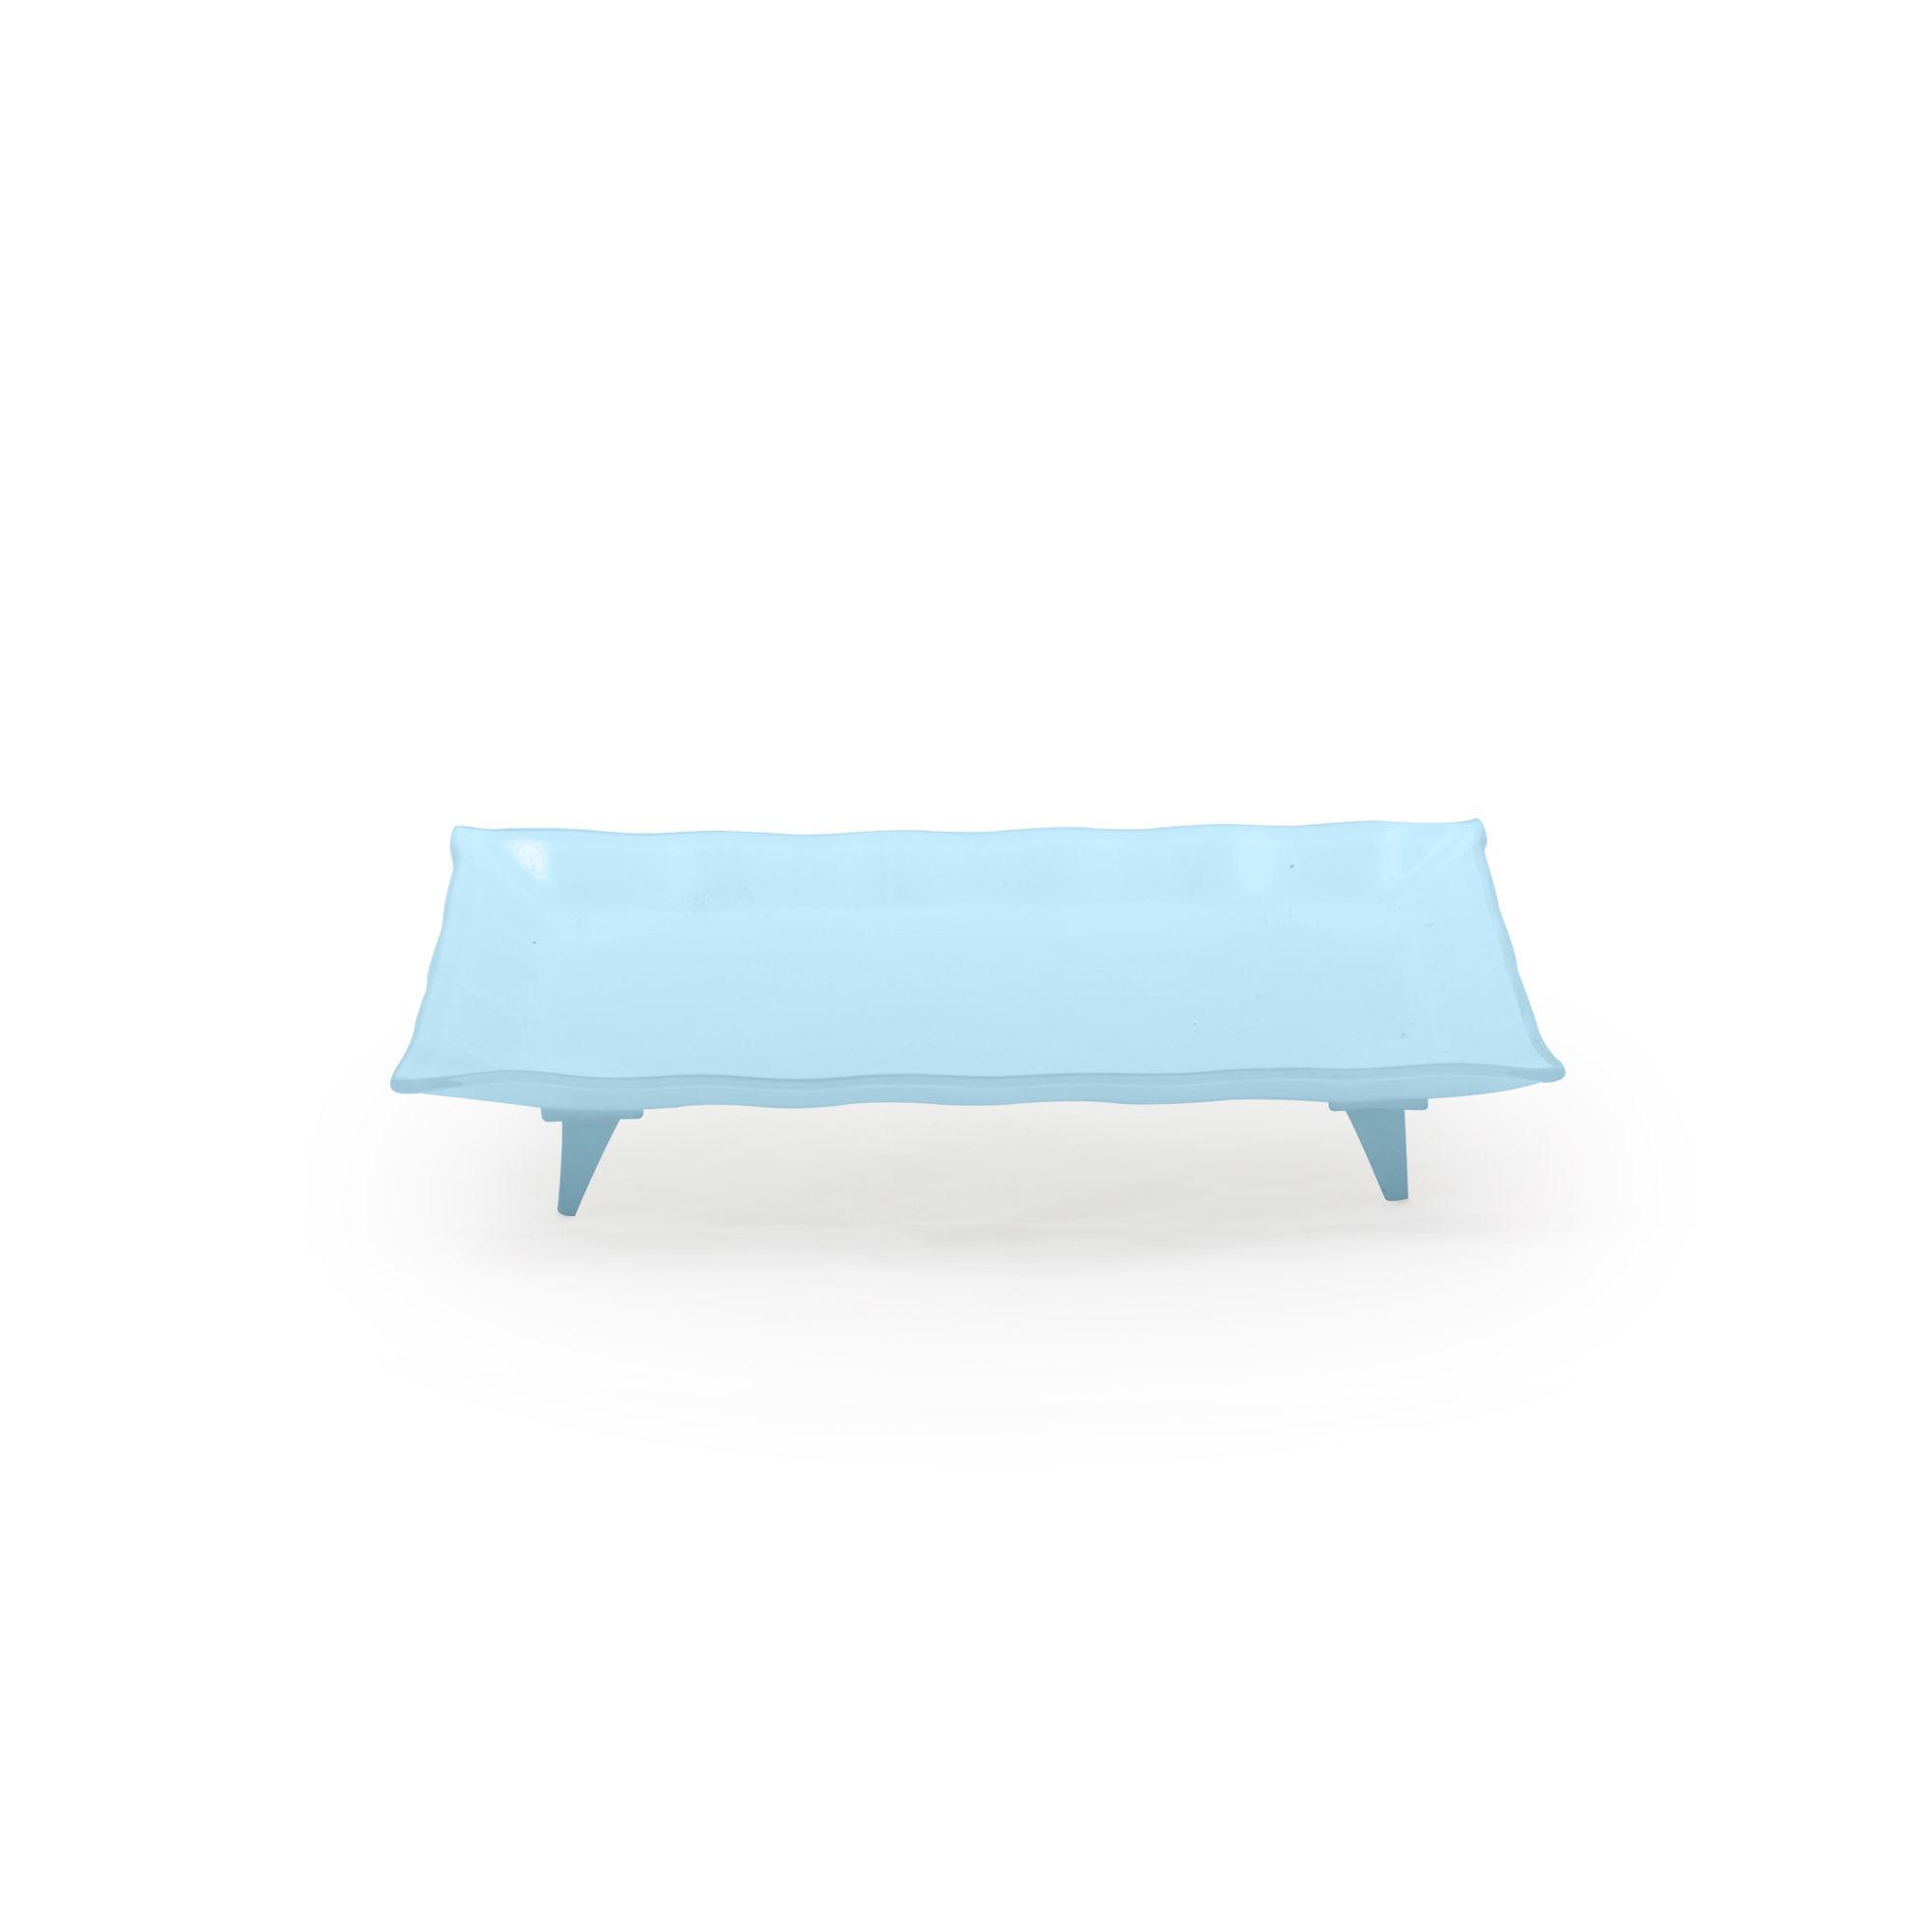 Travessa de vidro retangular pequena azul